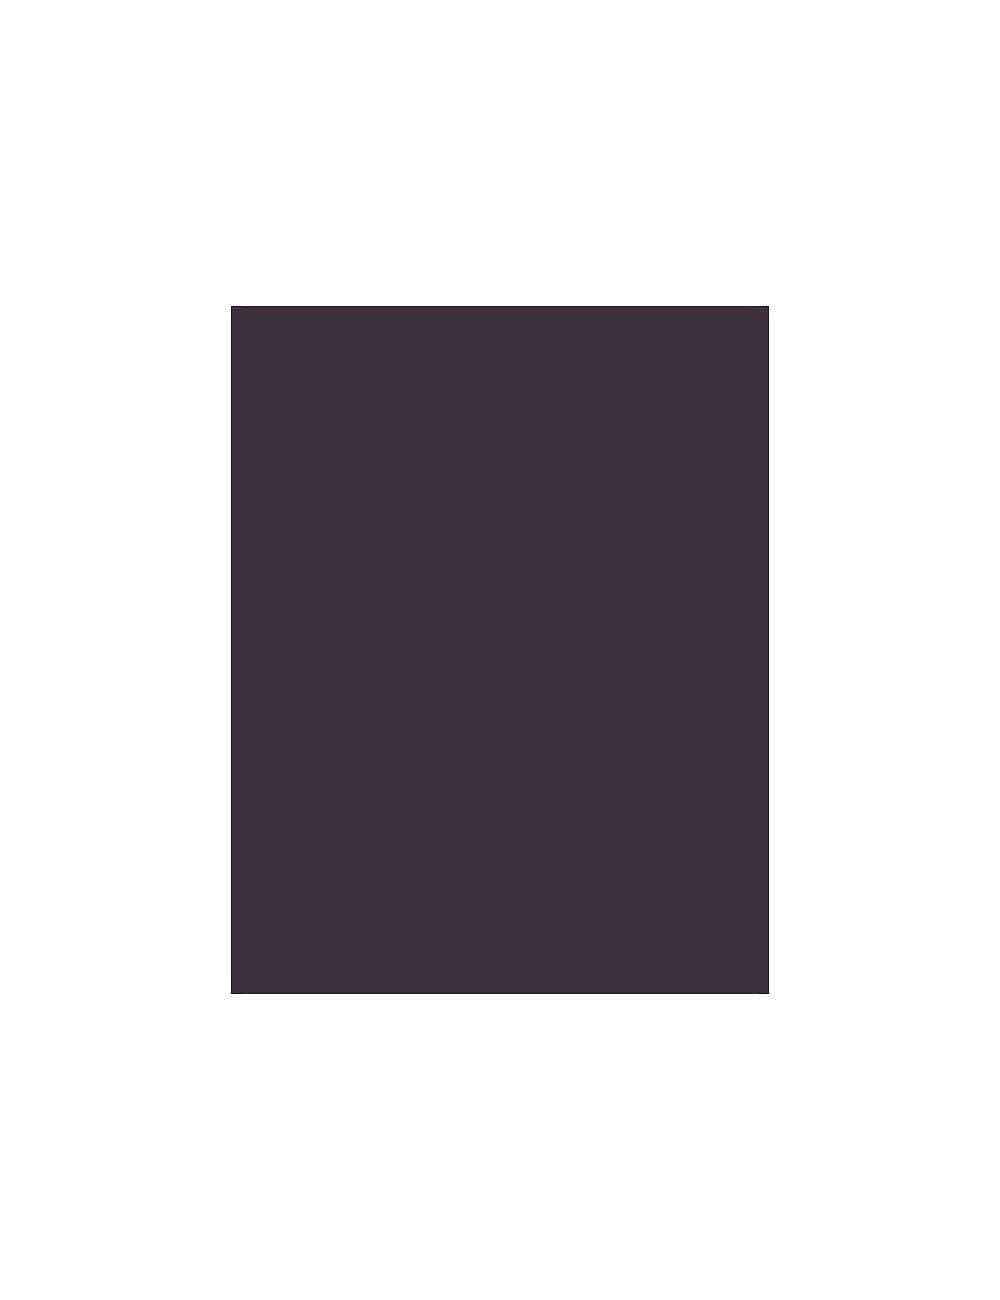 YISEVEN Guante Hombre Pantalla T/áctil Invierno de Cuero de Oveja Piel de Cabra Dedo Completo C/álidos Forroda de Cachemira Largo T/érmico coche con de cintur/ón de bot/ón Conducci/ón moto regalo